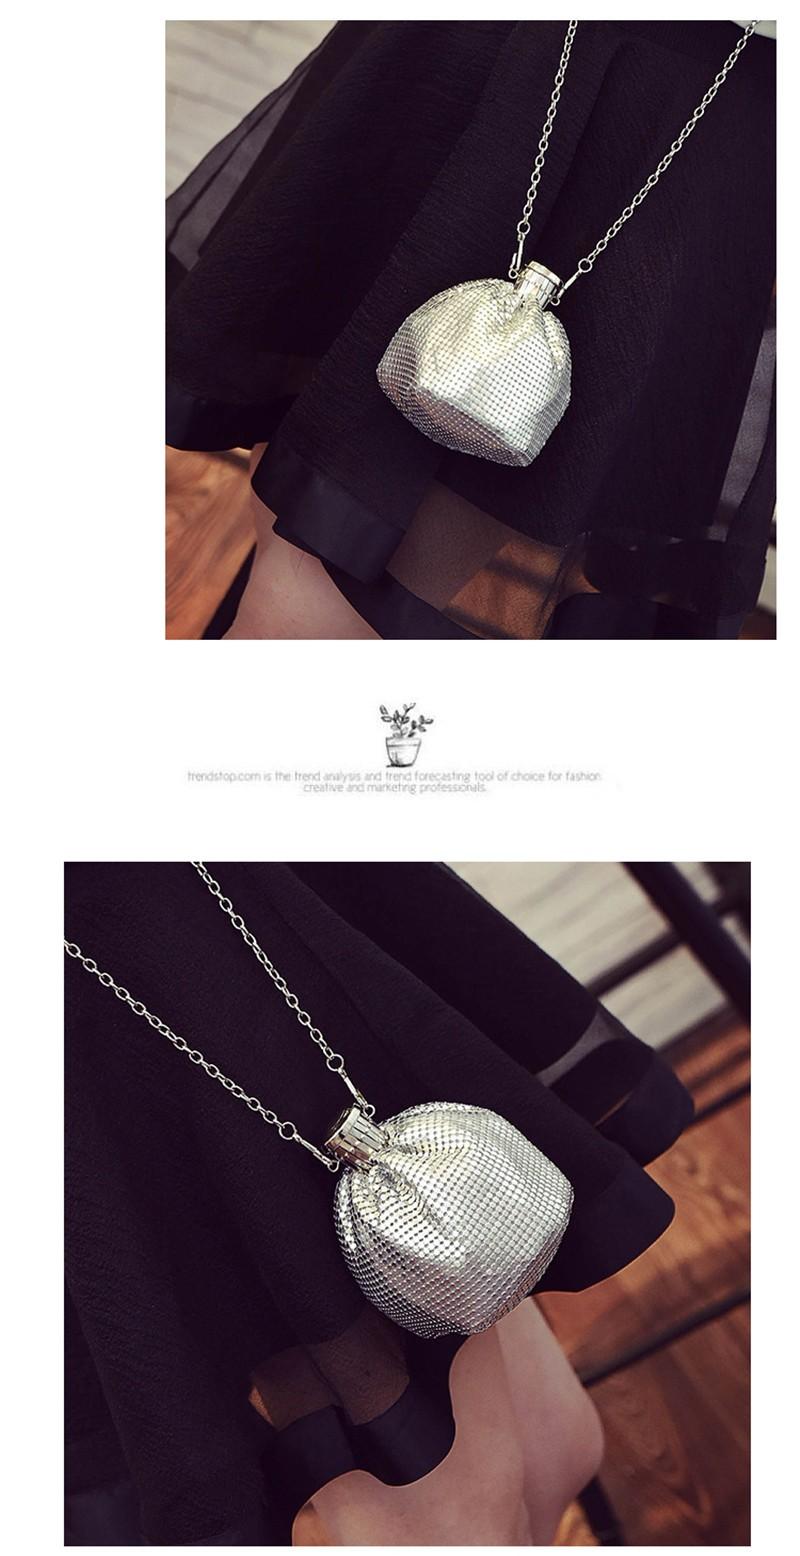 New-Shape-Hip-Flask-Bag-Fashion-Chain-Bucket-Personality-Single-Shoulder-Handbag-Women-Cross-Body-BAGS-SS0204 (11)